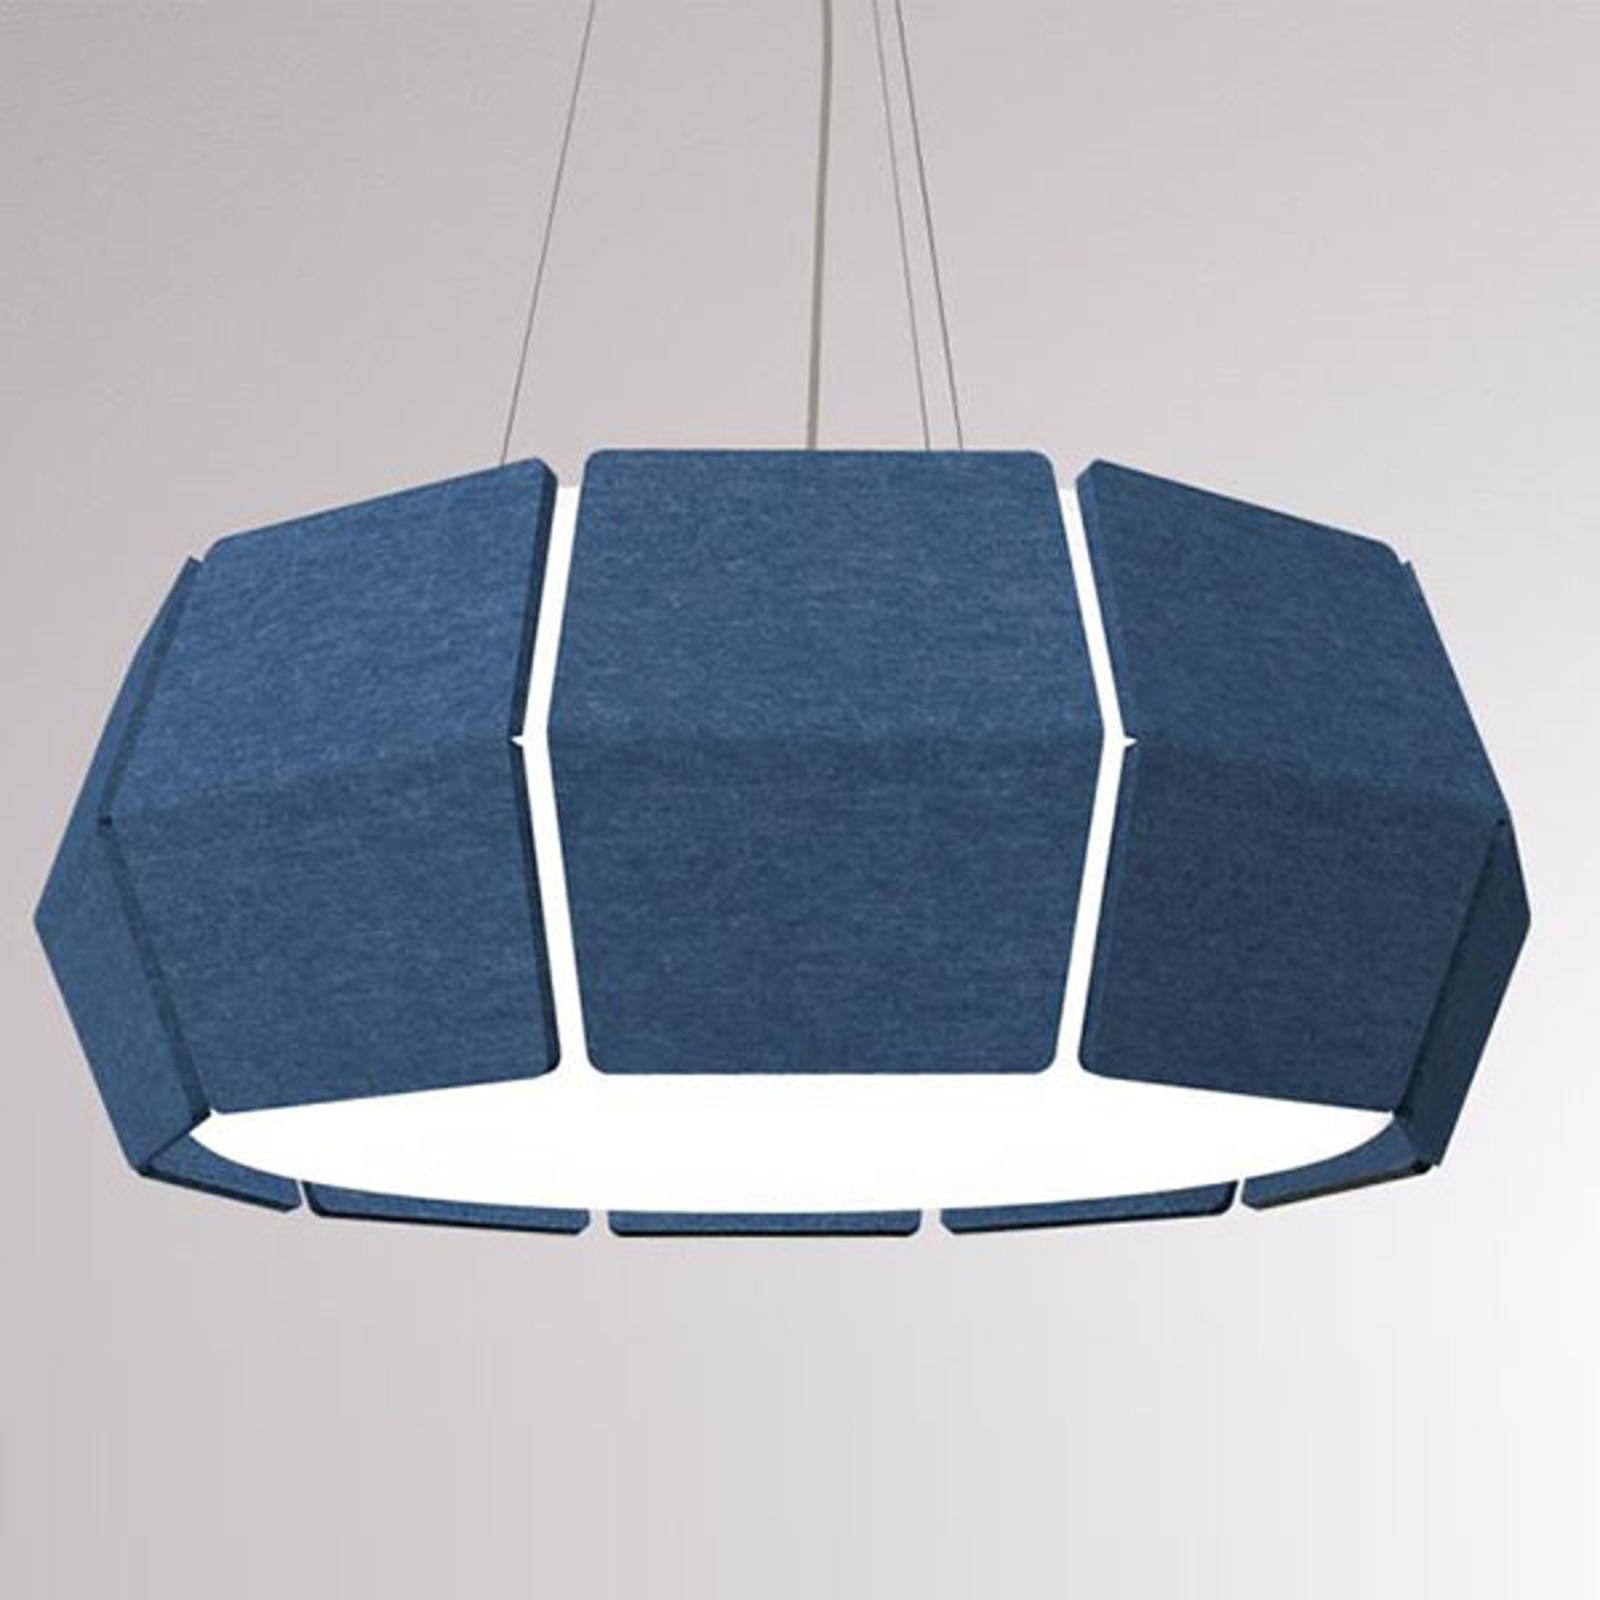 LOUM Decafelt LED hanglamp akoestiek blauw Ø 76 cm